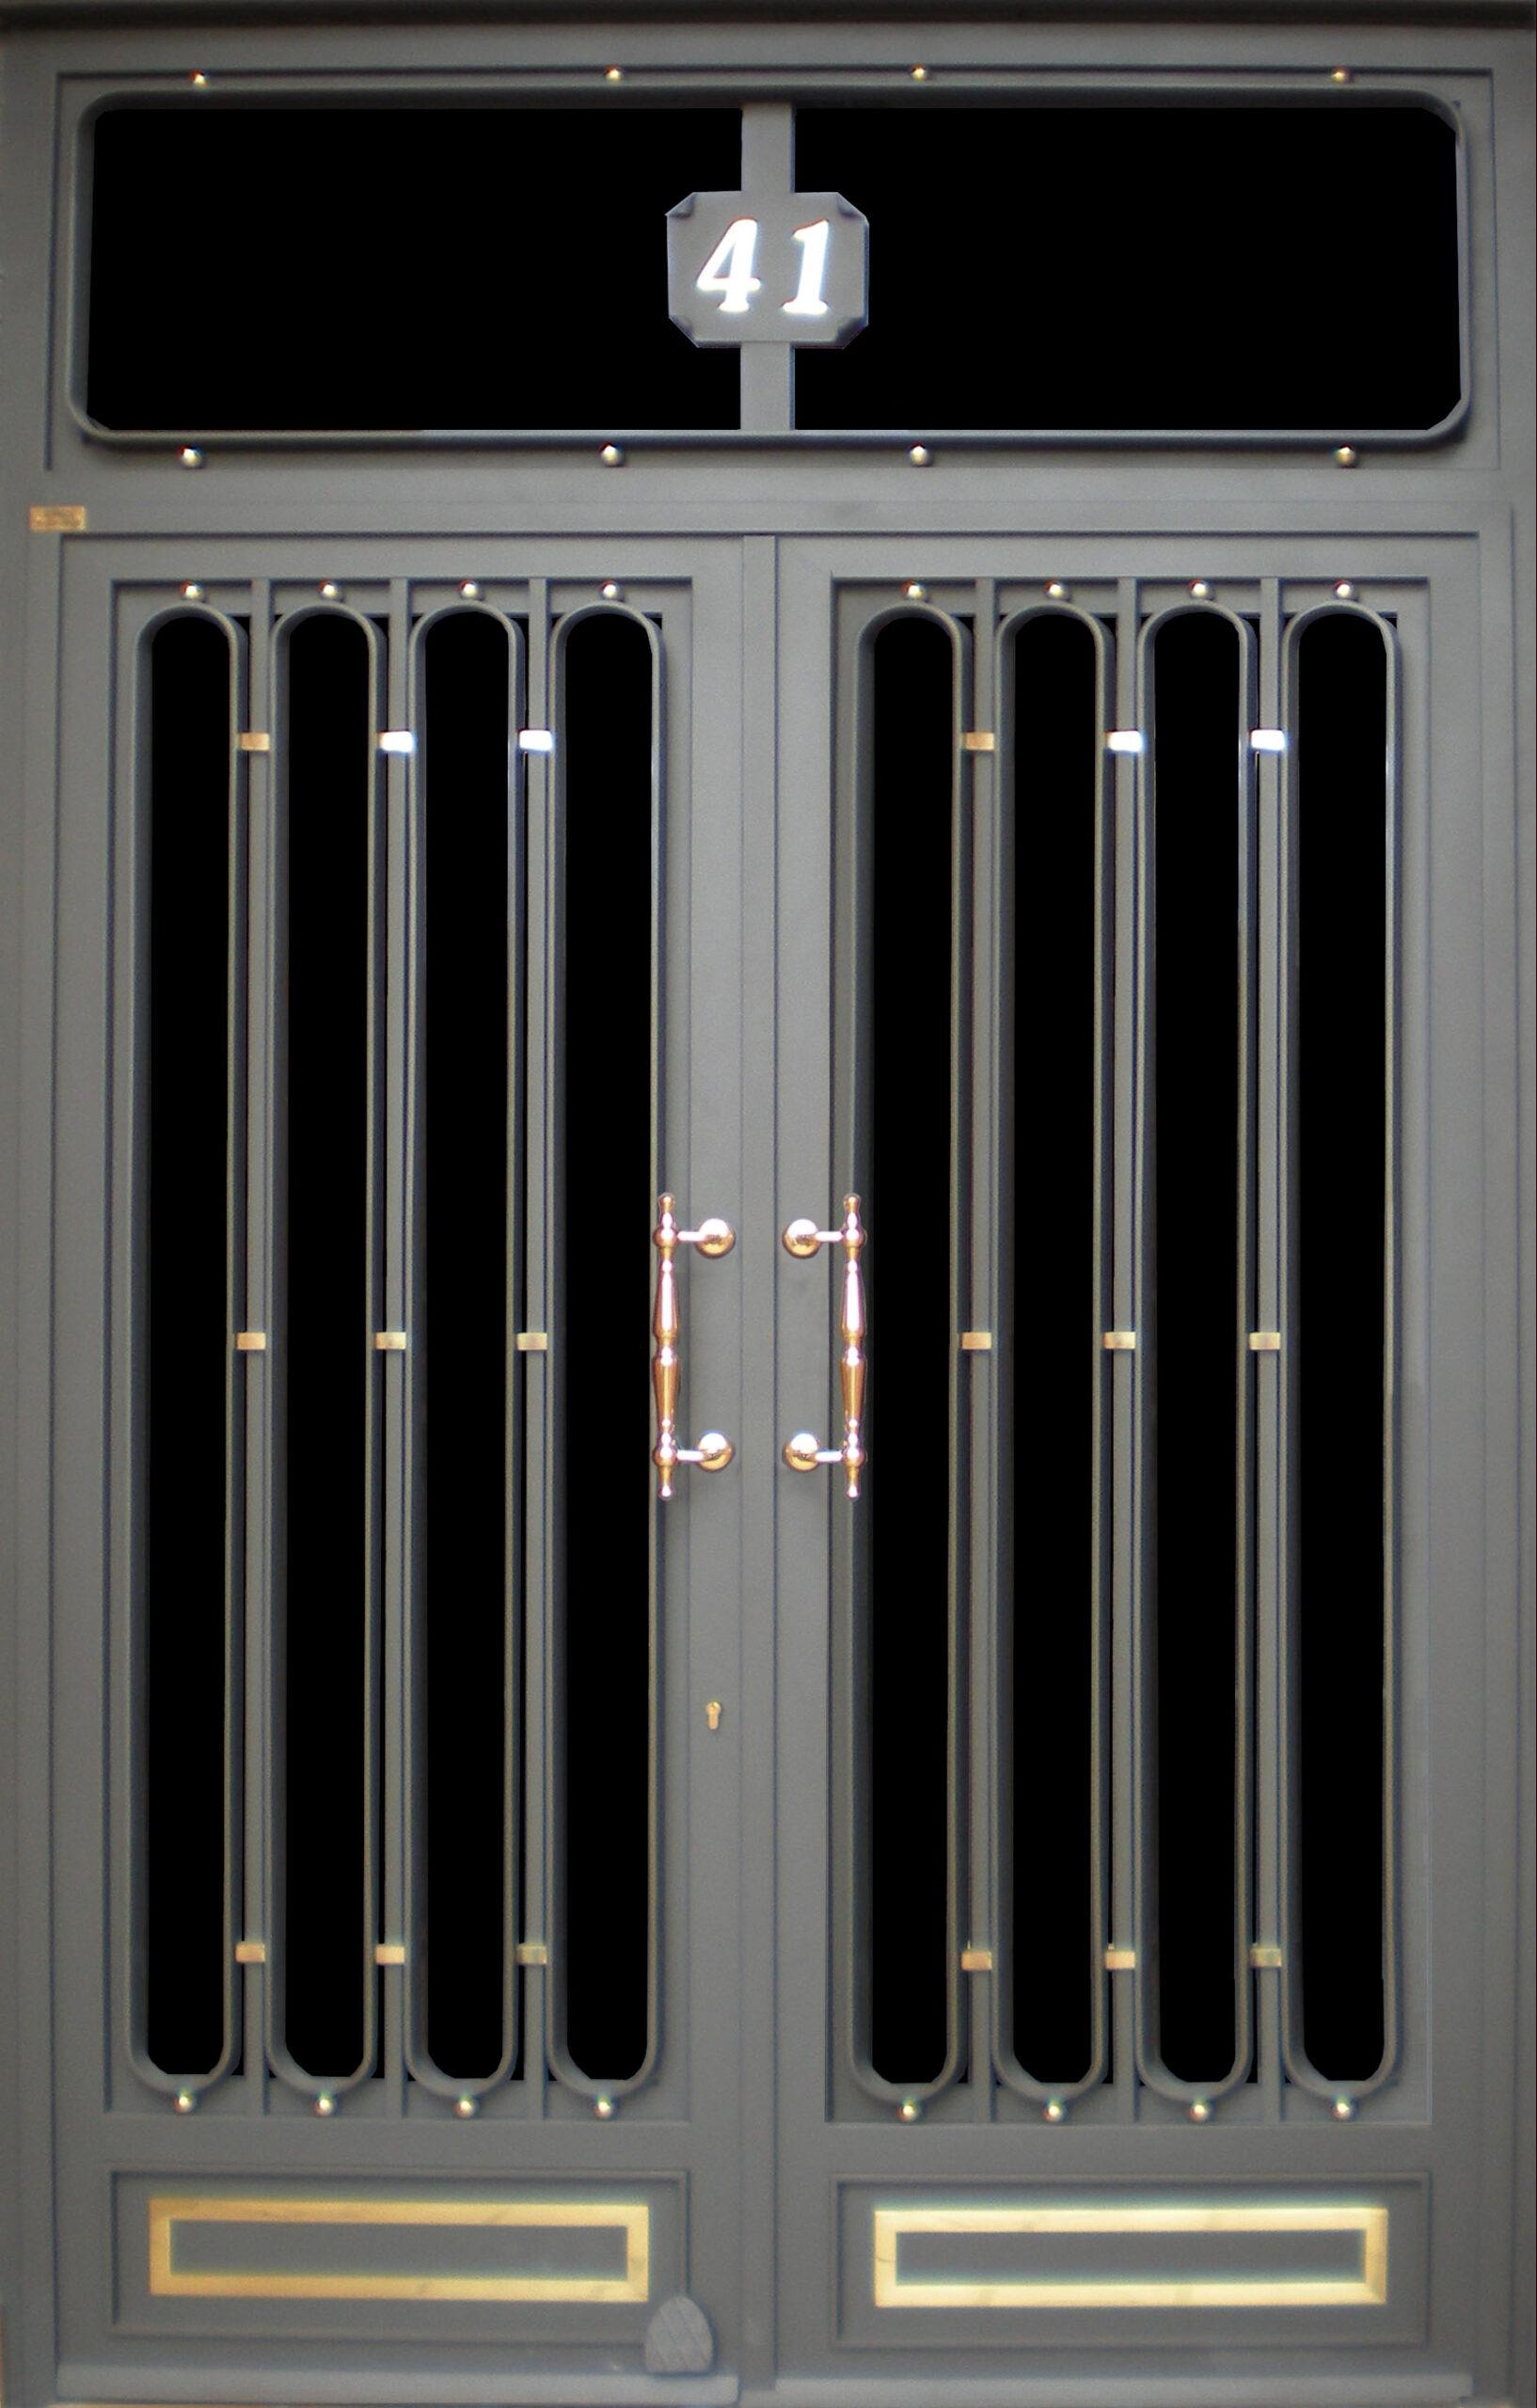 Modelo puerta HORTALEZA